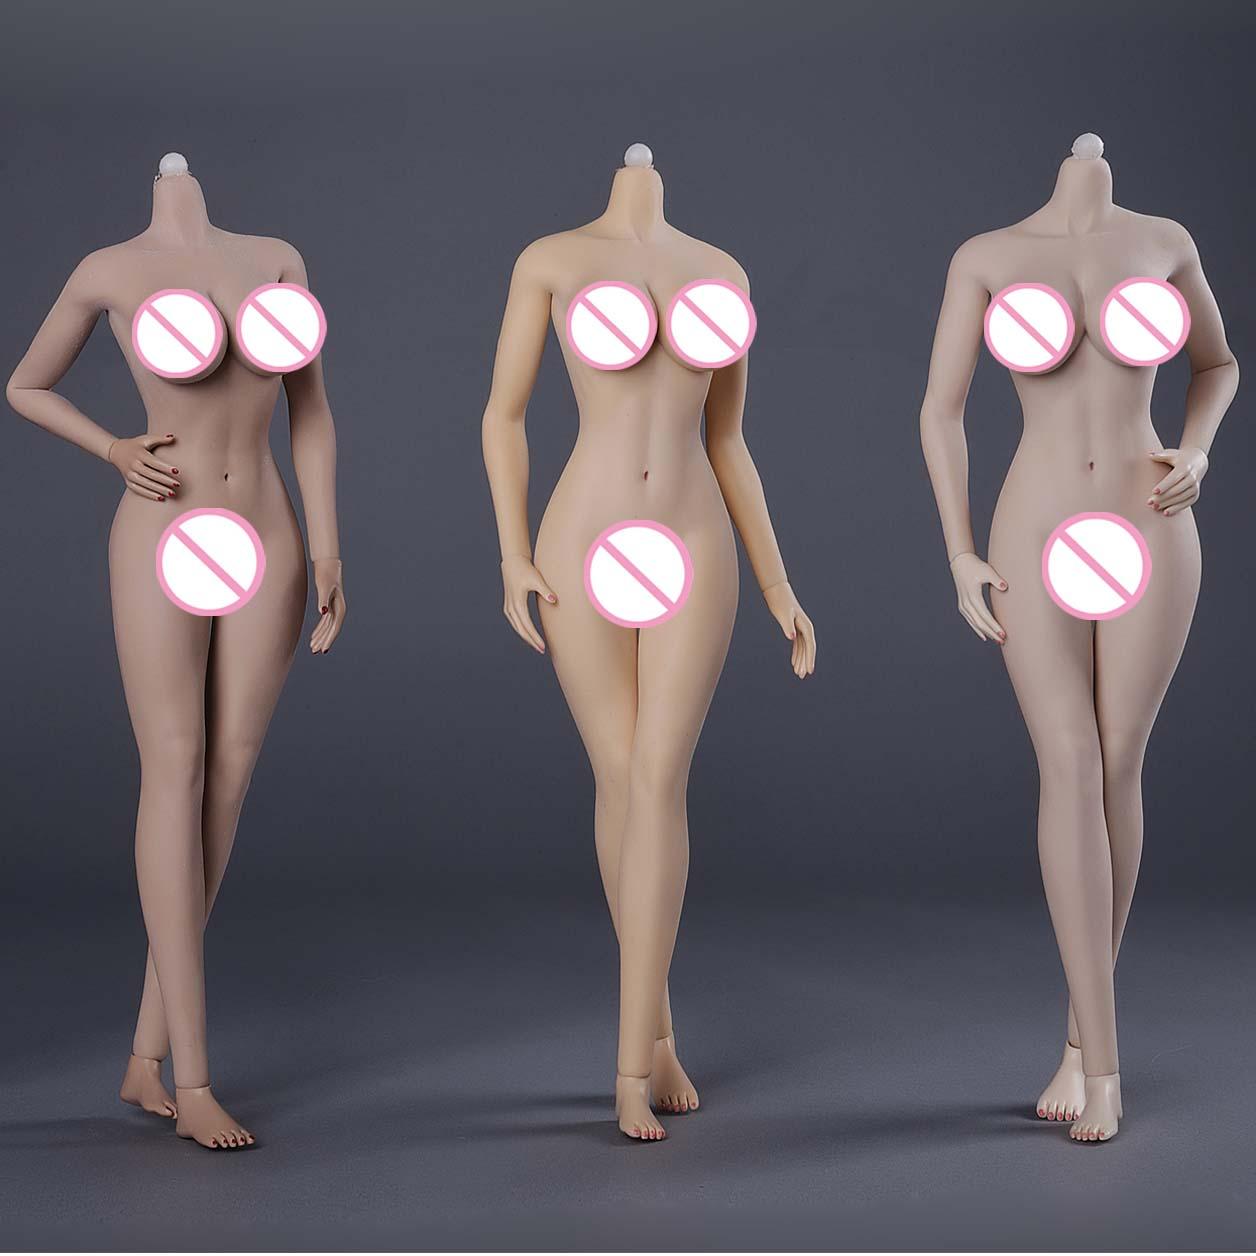 jiaou boneca 3 0 1 6 escala figura super flexivel forma europeia grande busto corpo sem